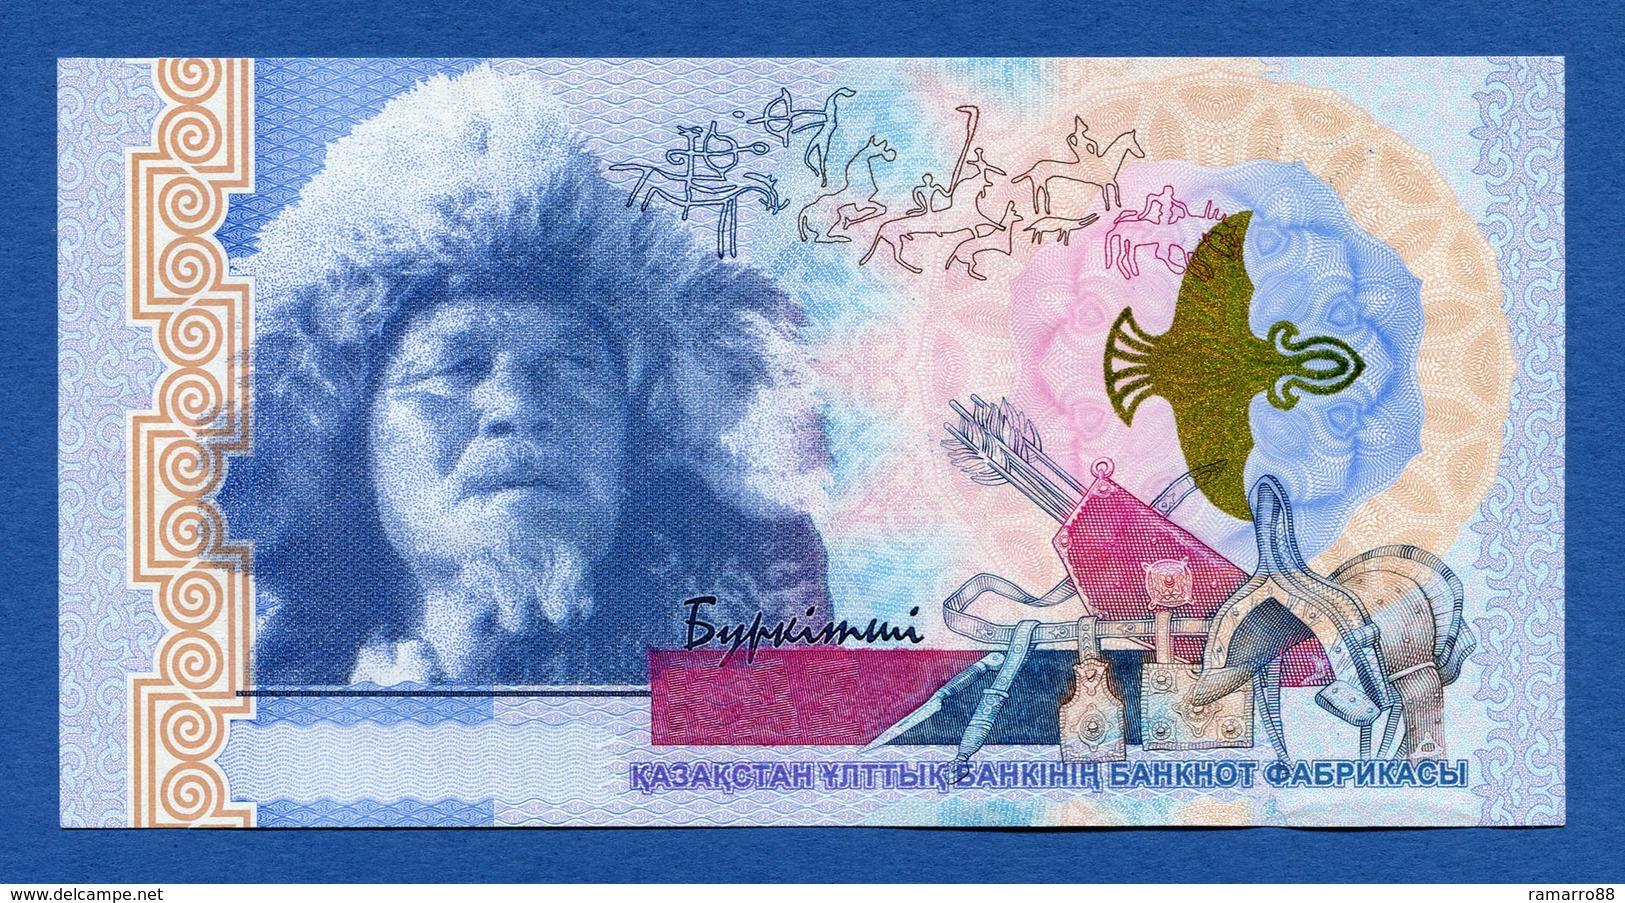 Kazakhstan National Bank Banknote Factory Berkutchi 2011 Specimen Test Note Unc - Specimen